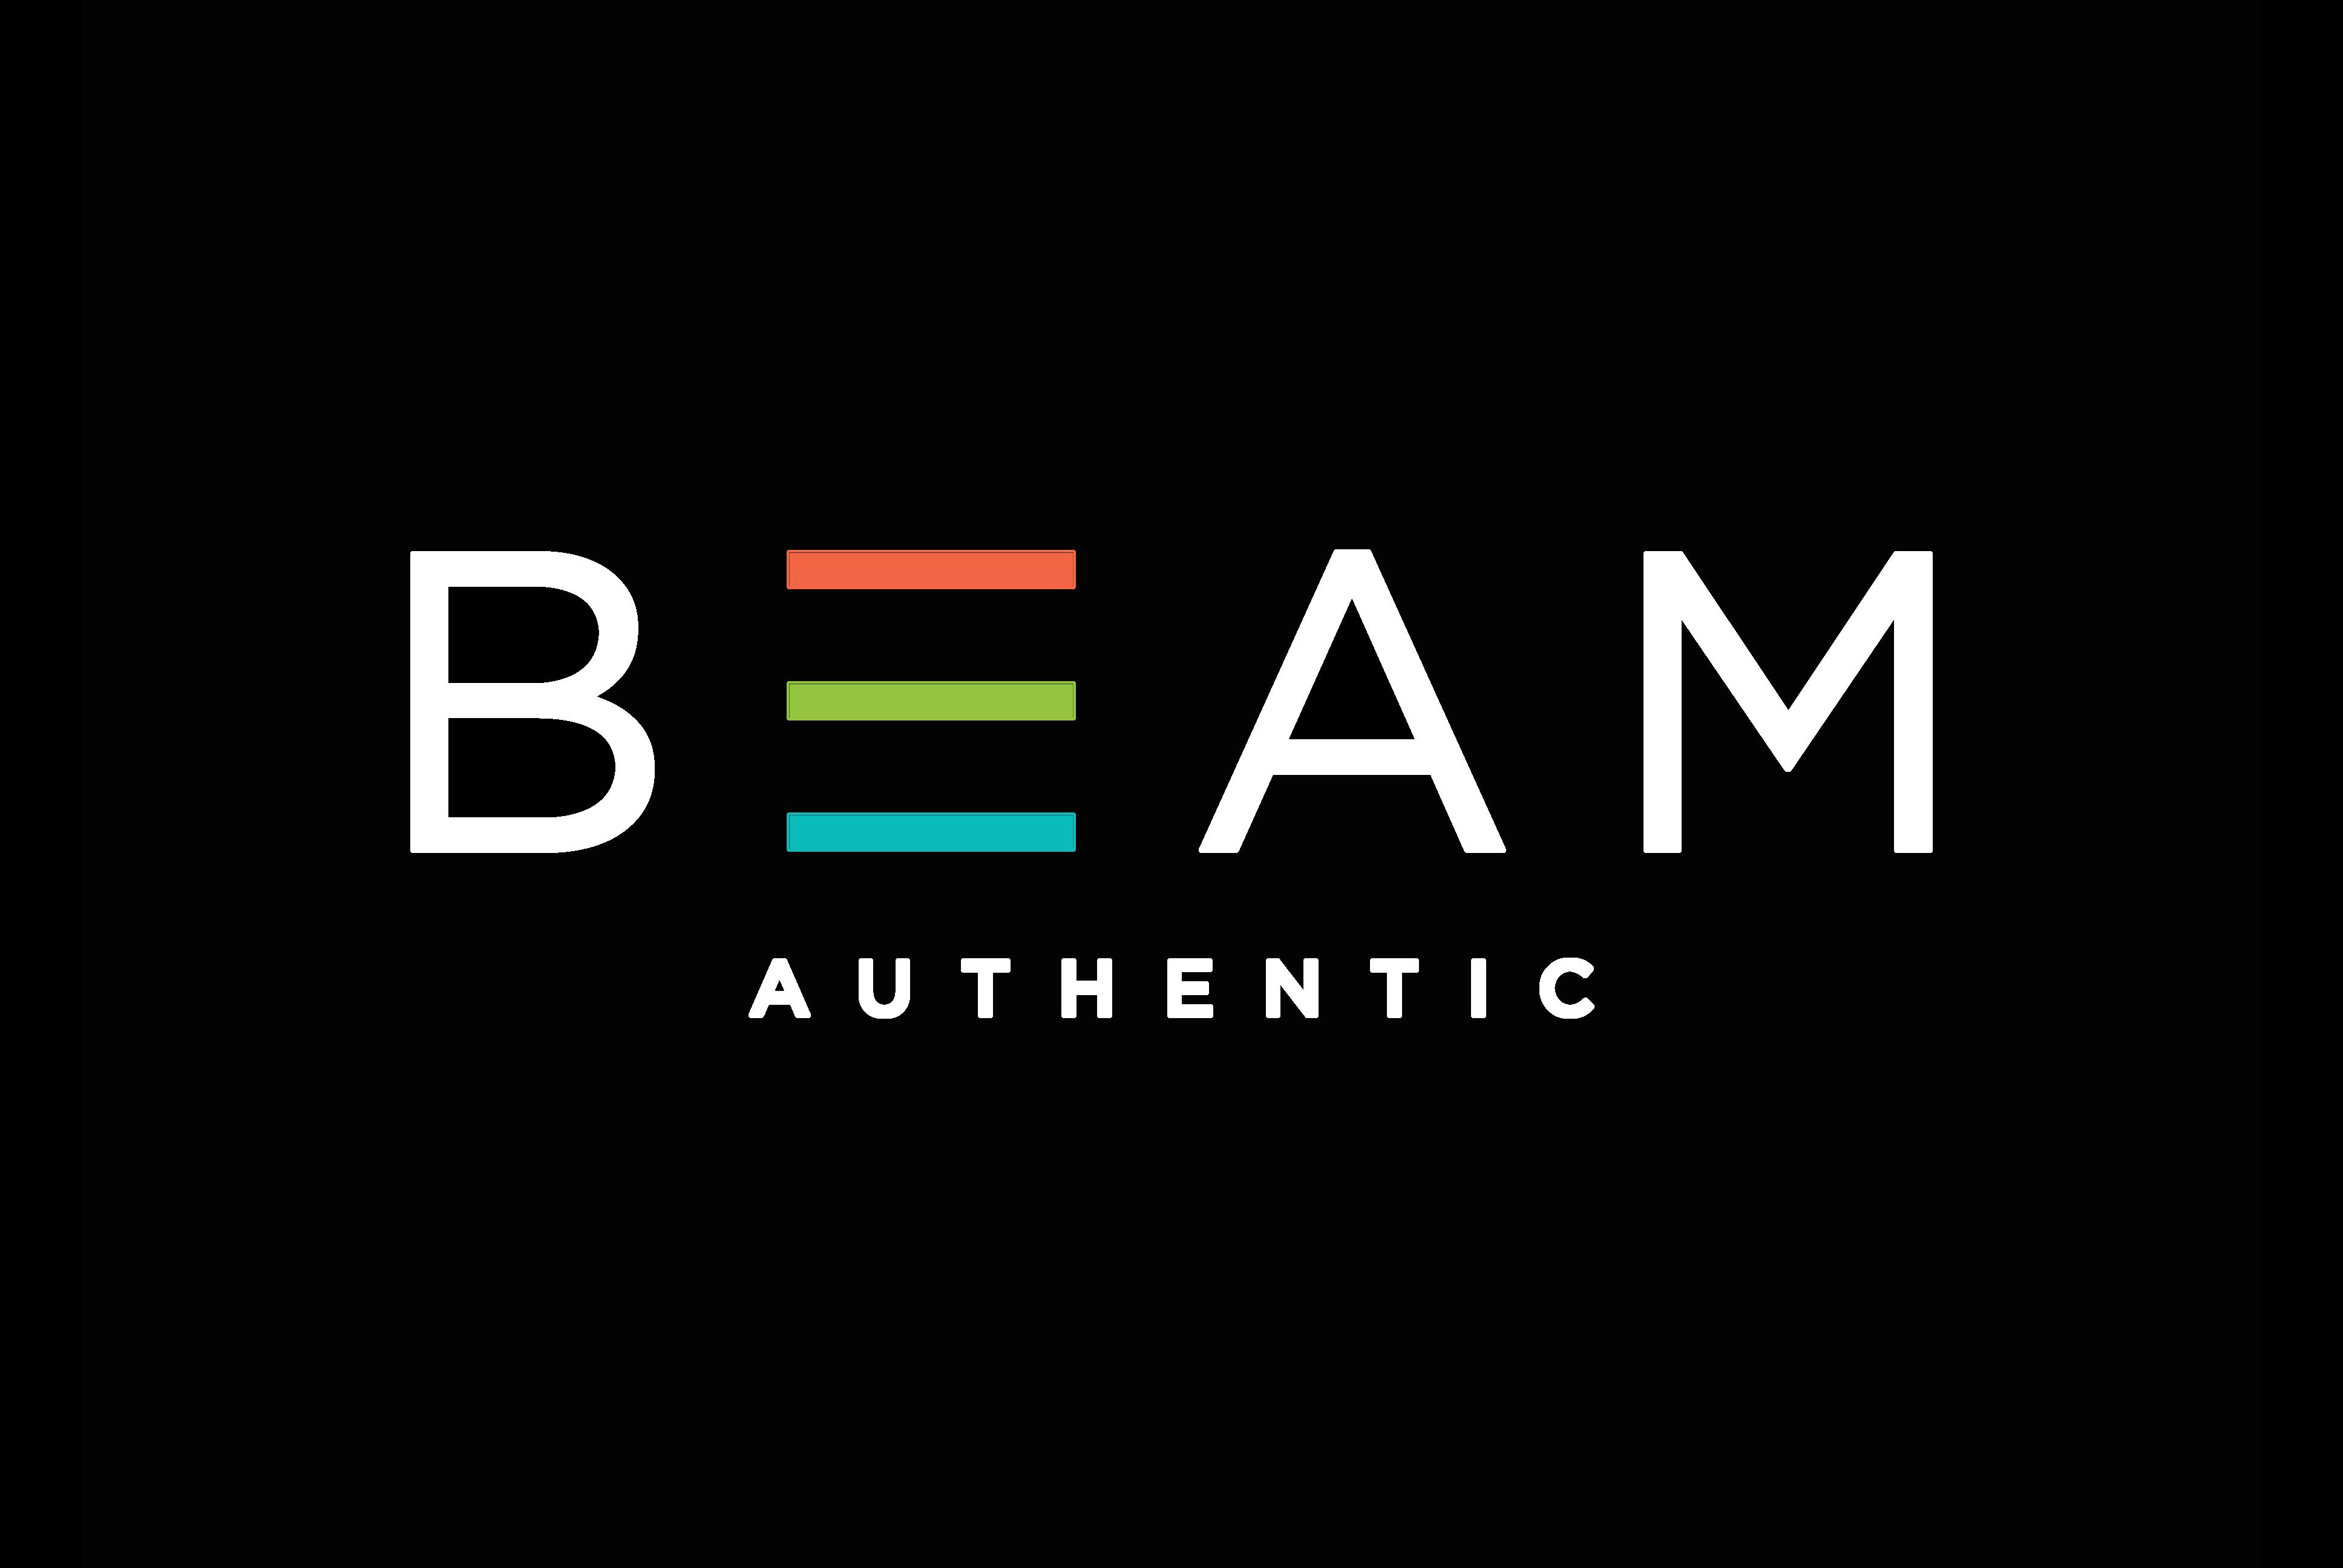 hot sale online 3c6c4 d767d BEAM Authentic Logo on Black - .jpg